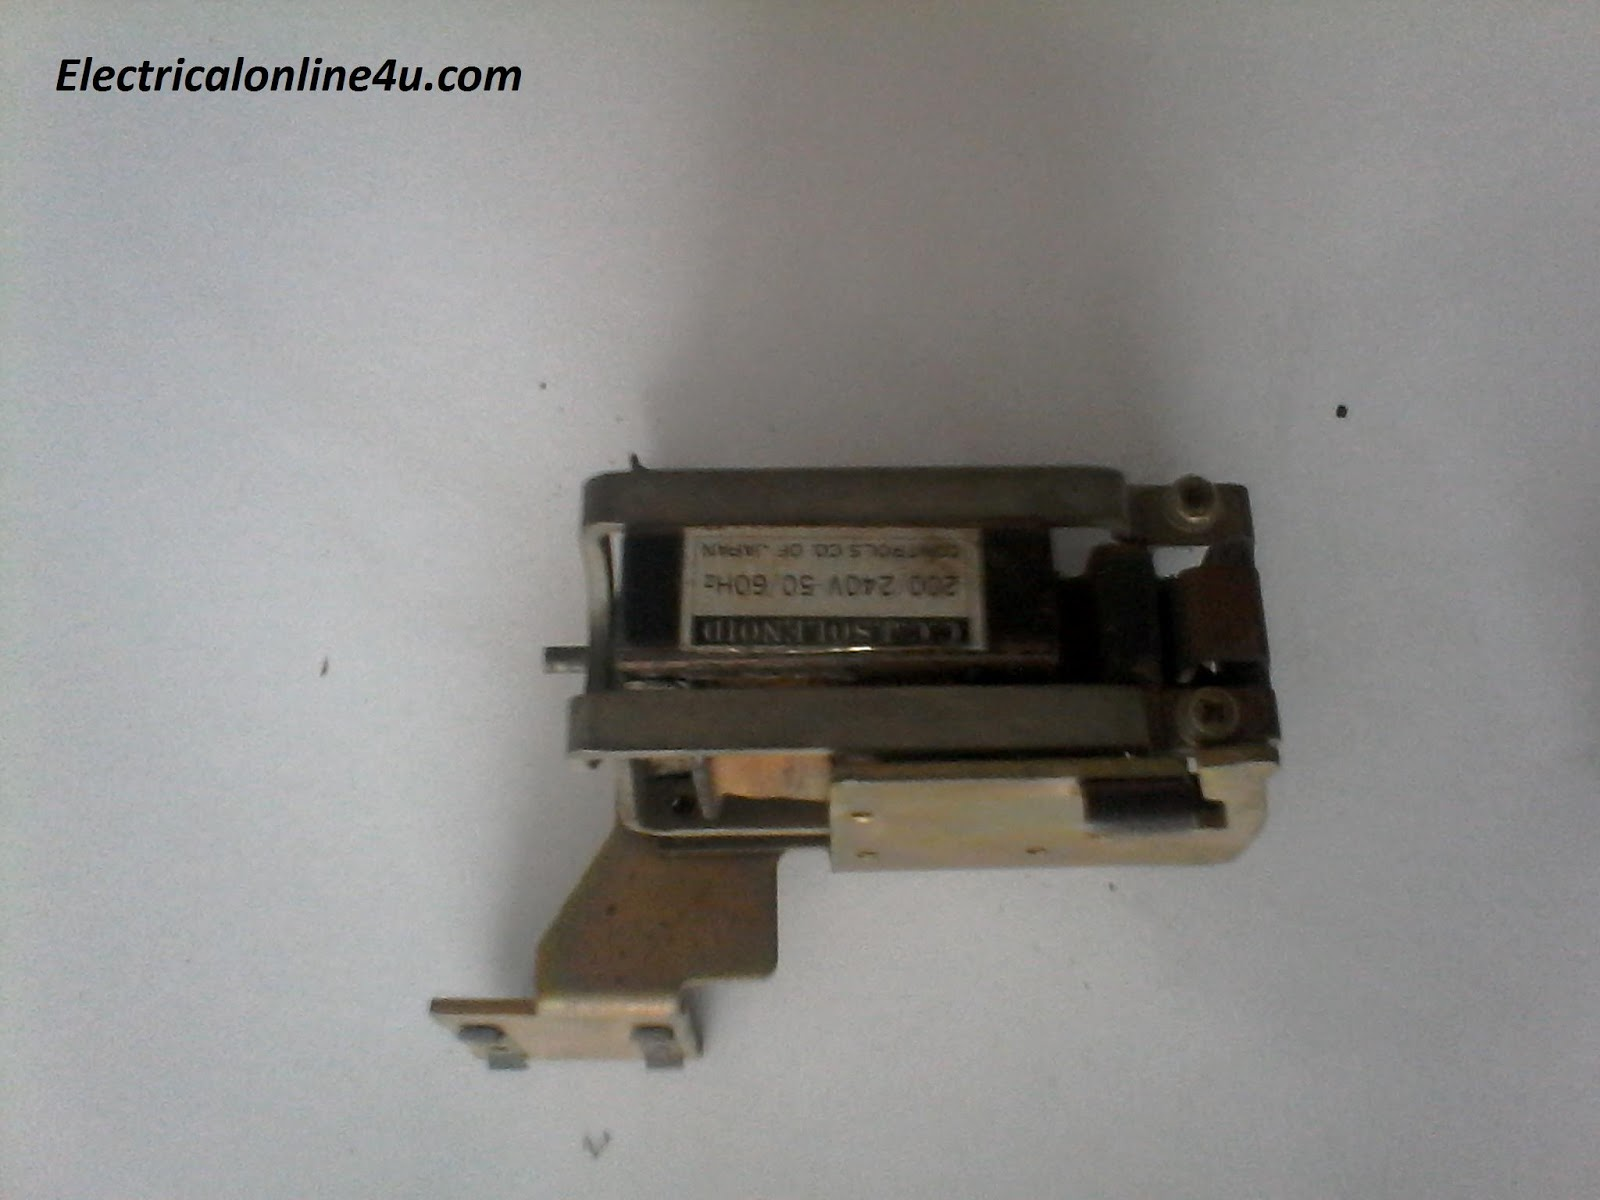 shunt trip coil diagram pontiac sunfire radio wiring breaker explanation electrical